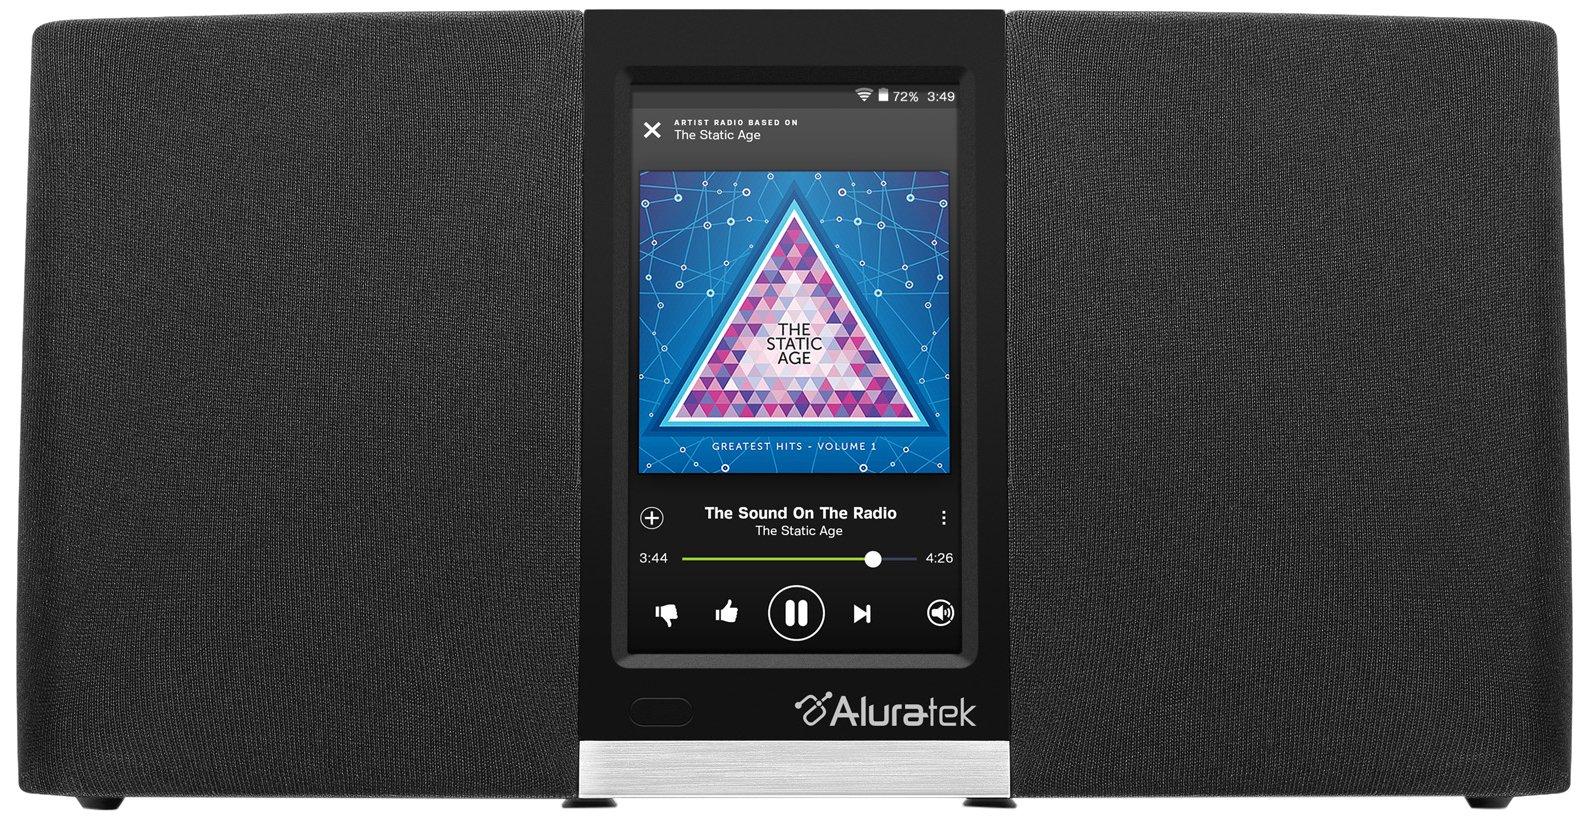 Aluratek AIRMM03F Wi-Fi Internet Radio Streaming Pandora Slacker iHeart Spoti…